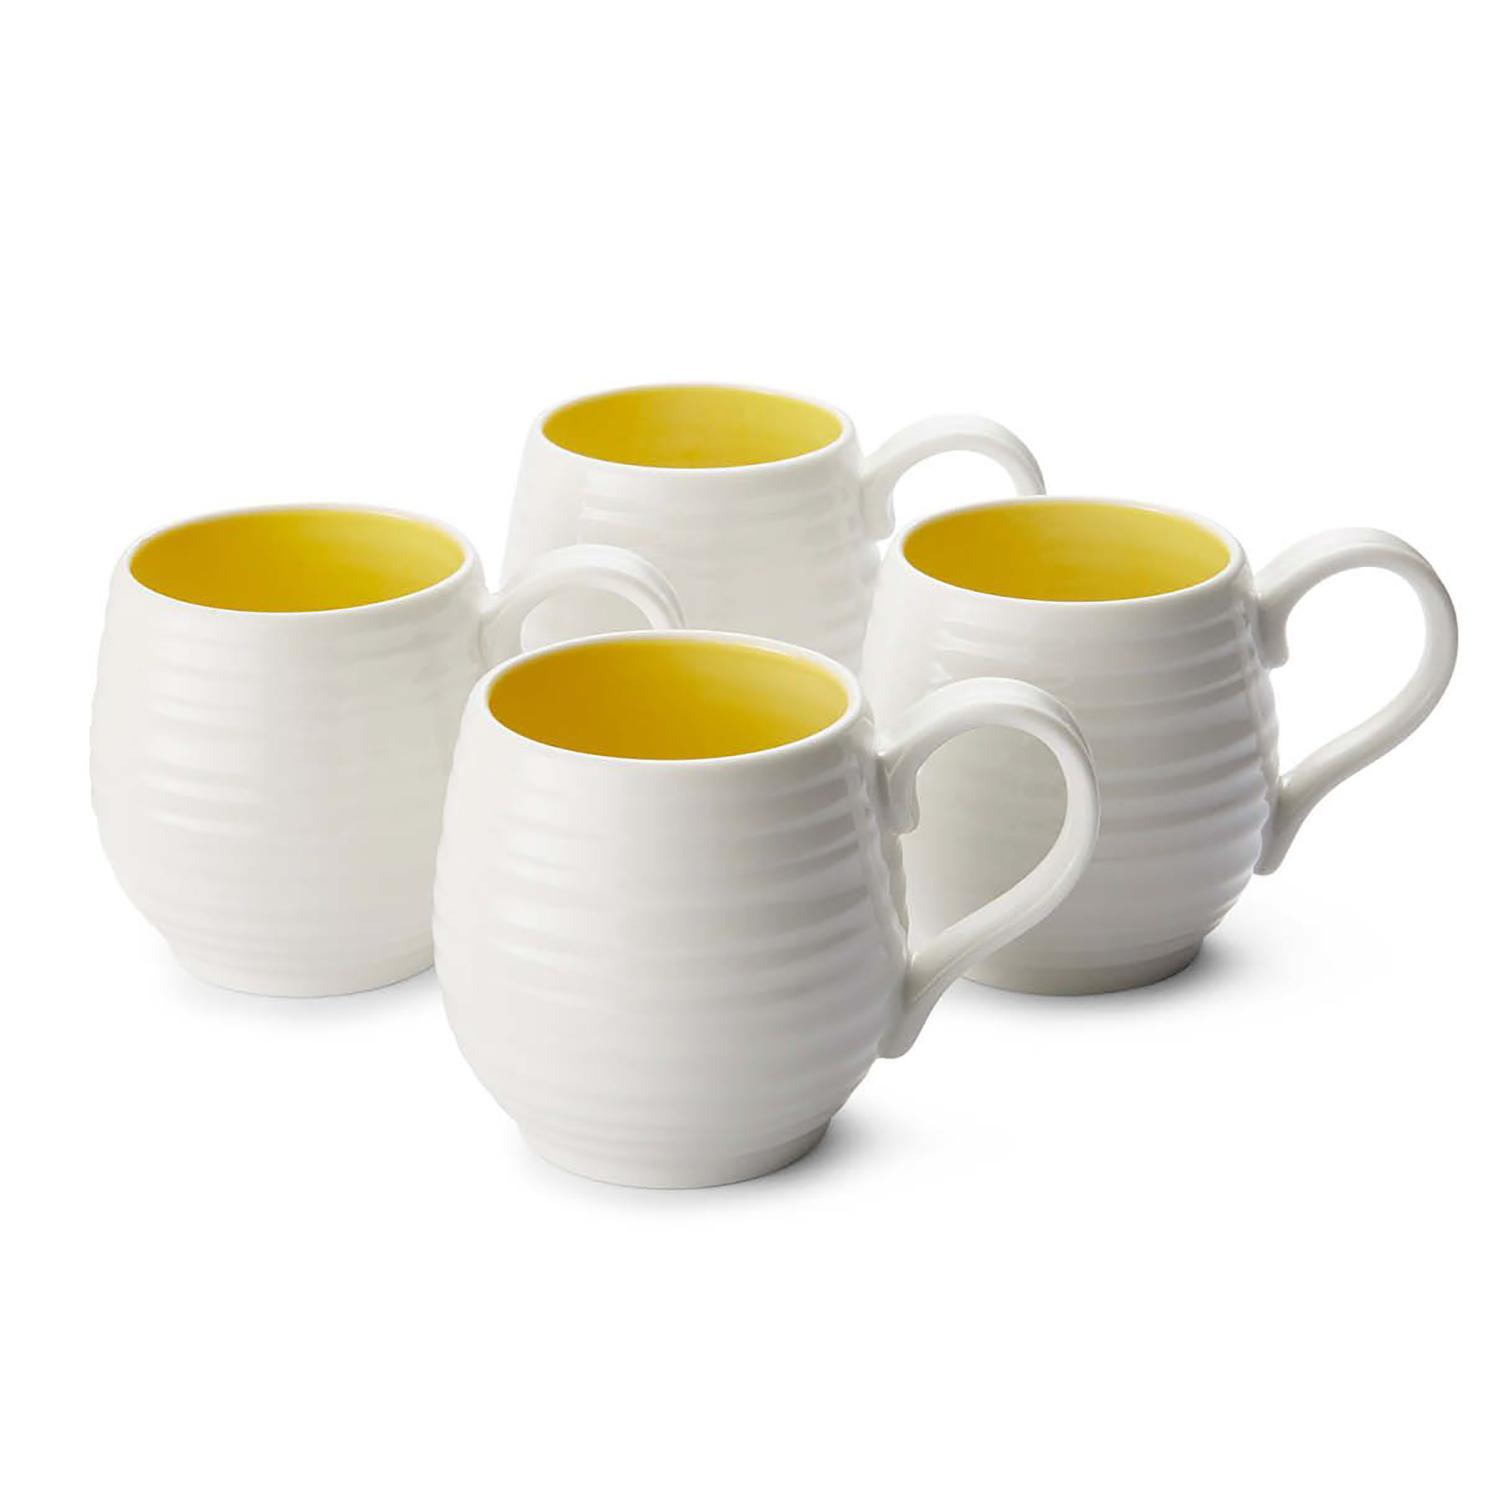 Sophie Conran for Portmeirion – Set of 4 Honey Pot Sunshine Barrel Mugs in Box